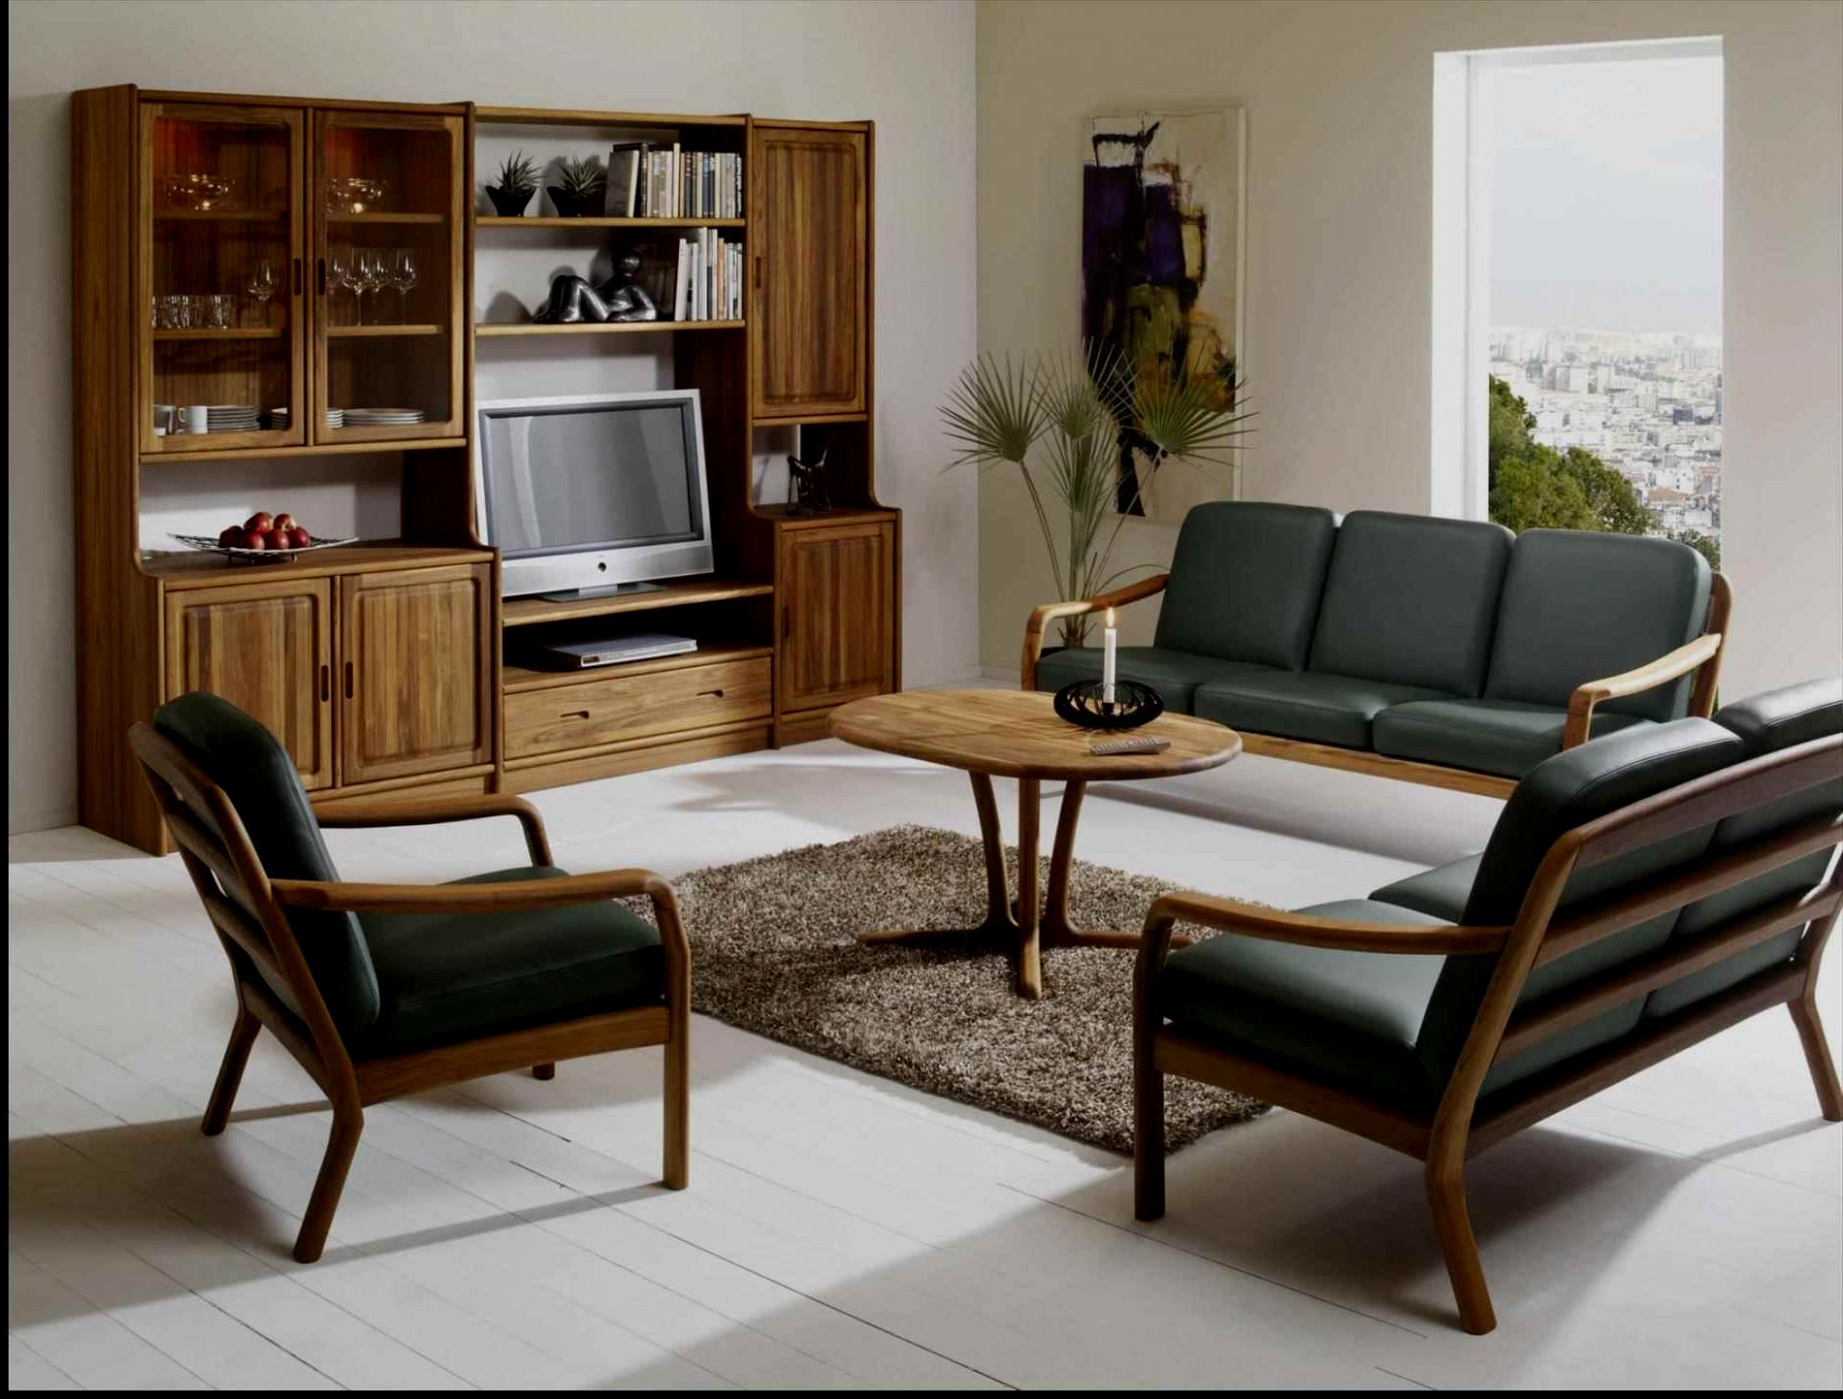 Sofa Cama De Diseño Q0d4 25 Agradable Muebles Diseà O Segunda Mano Busco Sillas